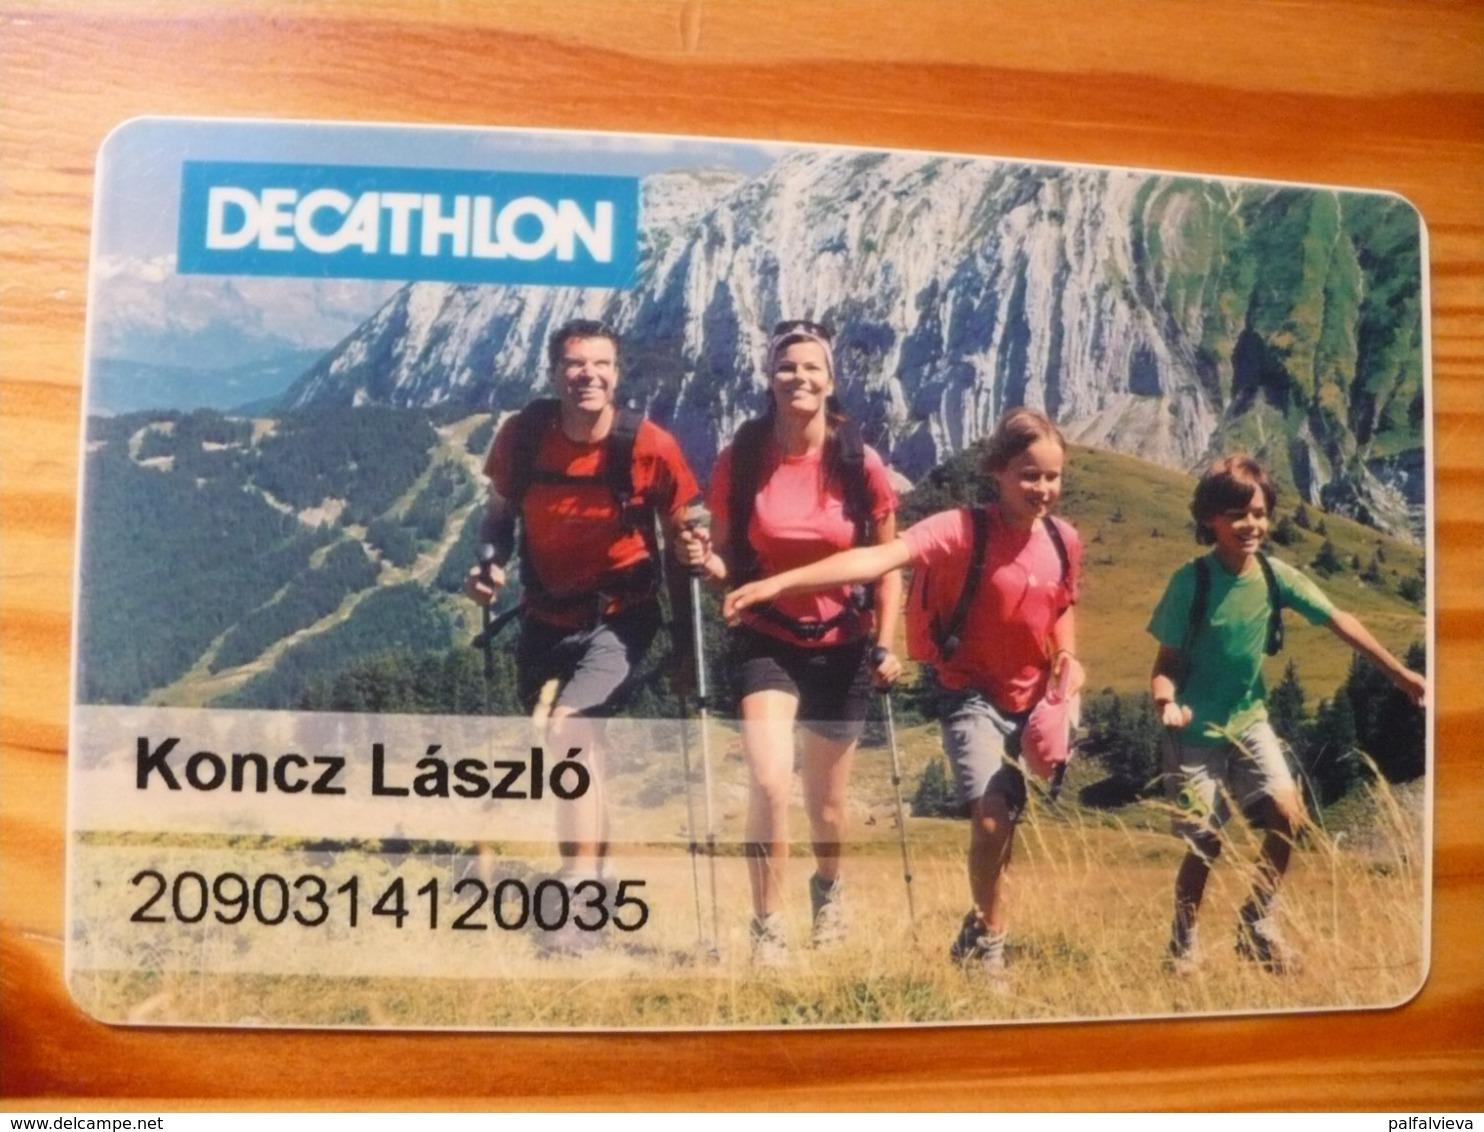 Decathlon Club Card Hungary - Sonstige